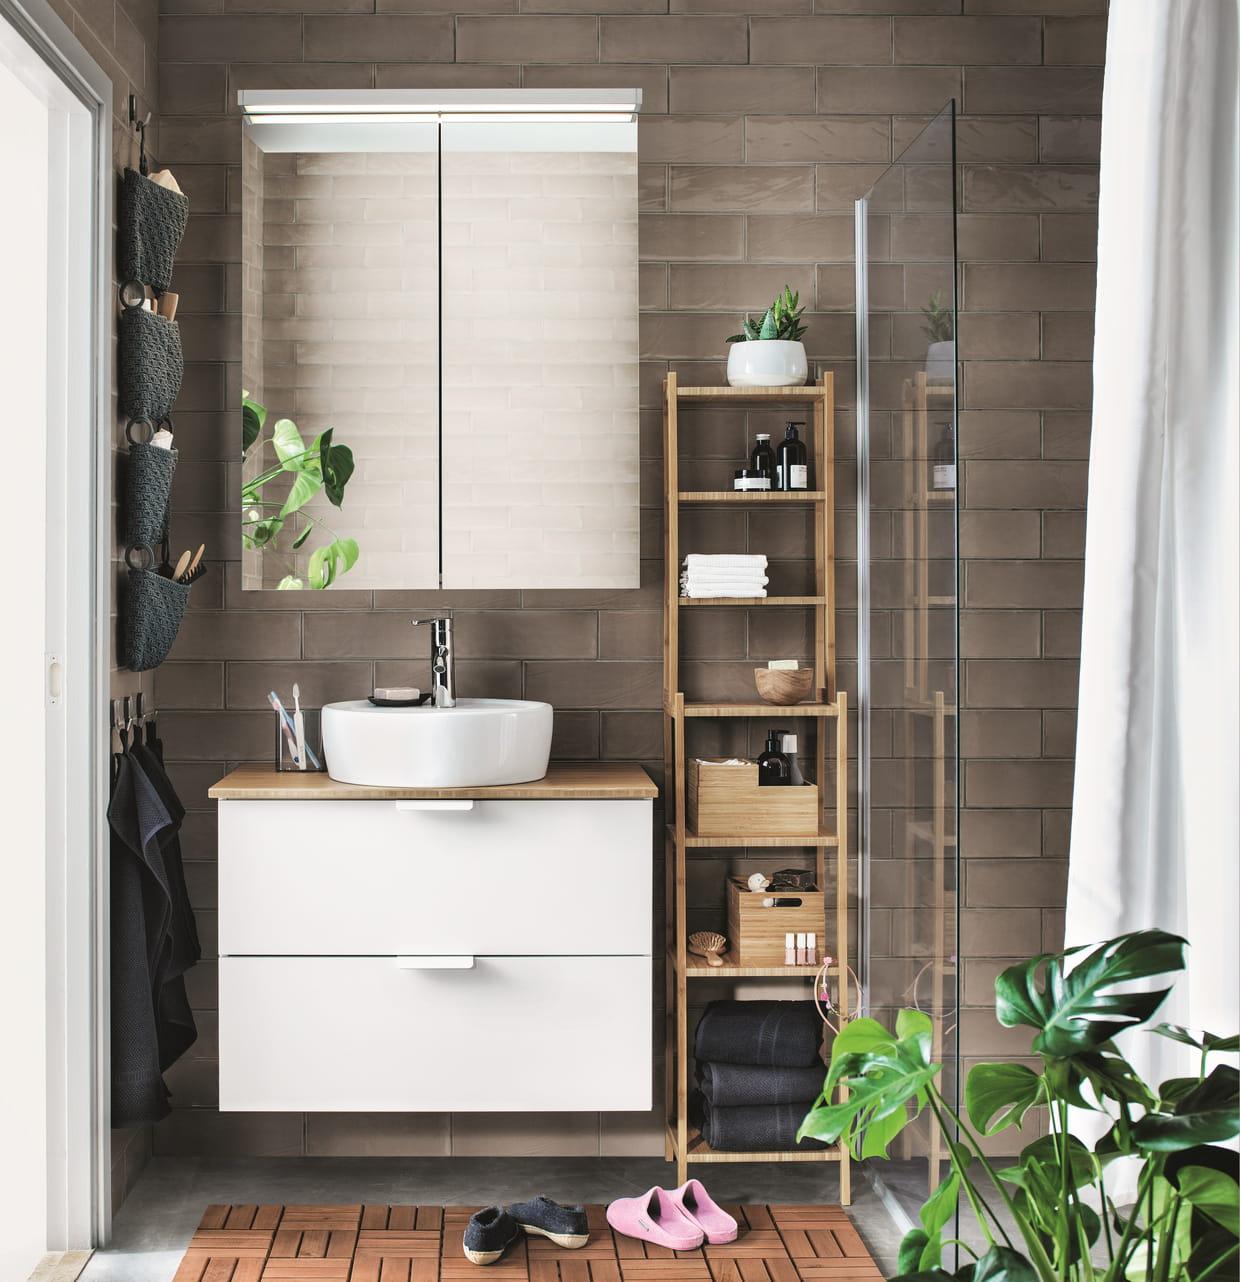 meuble godmorgon tolken t rnviken d 39 ikea. Black Bedroom Furniture Sets. Home Design Ideas